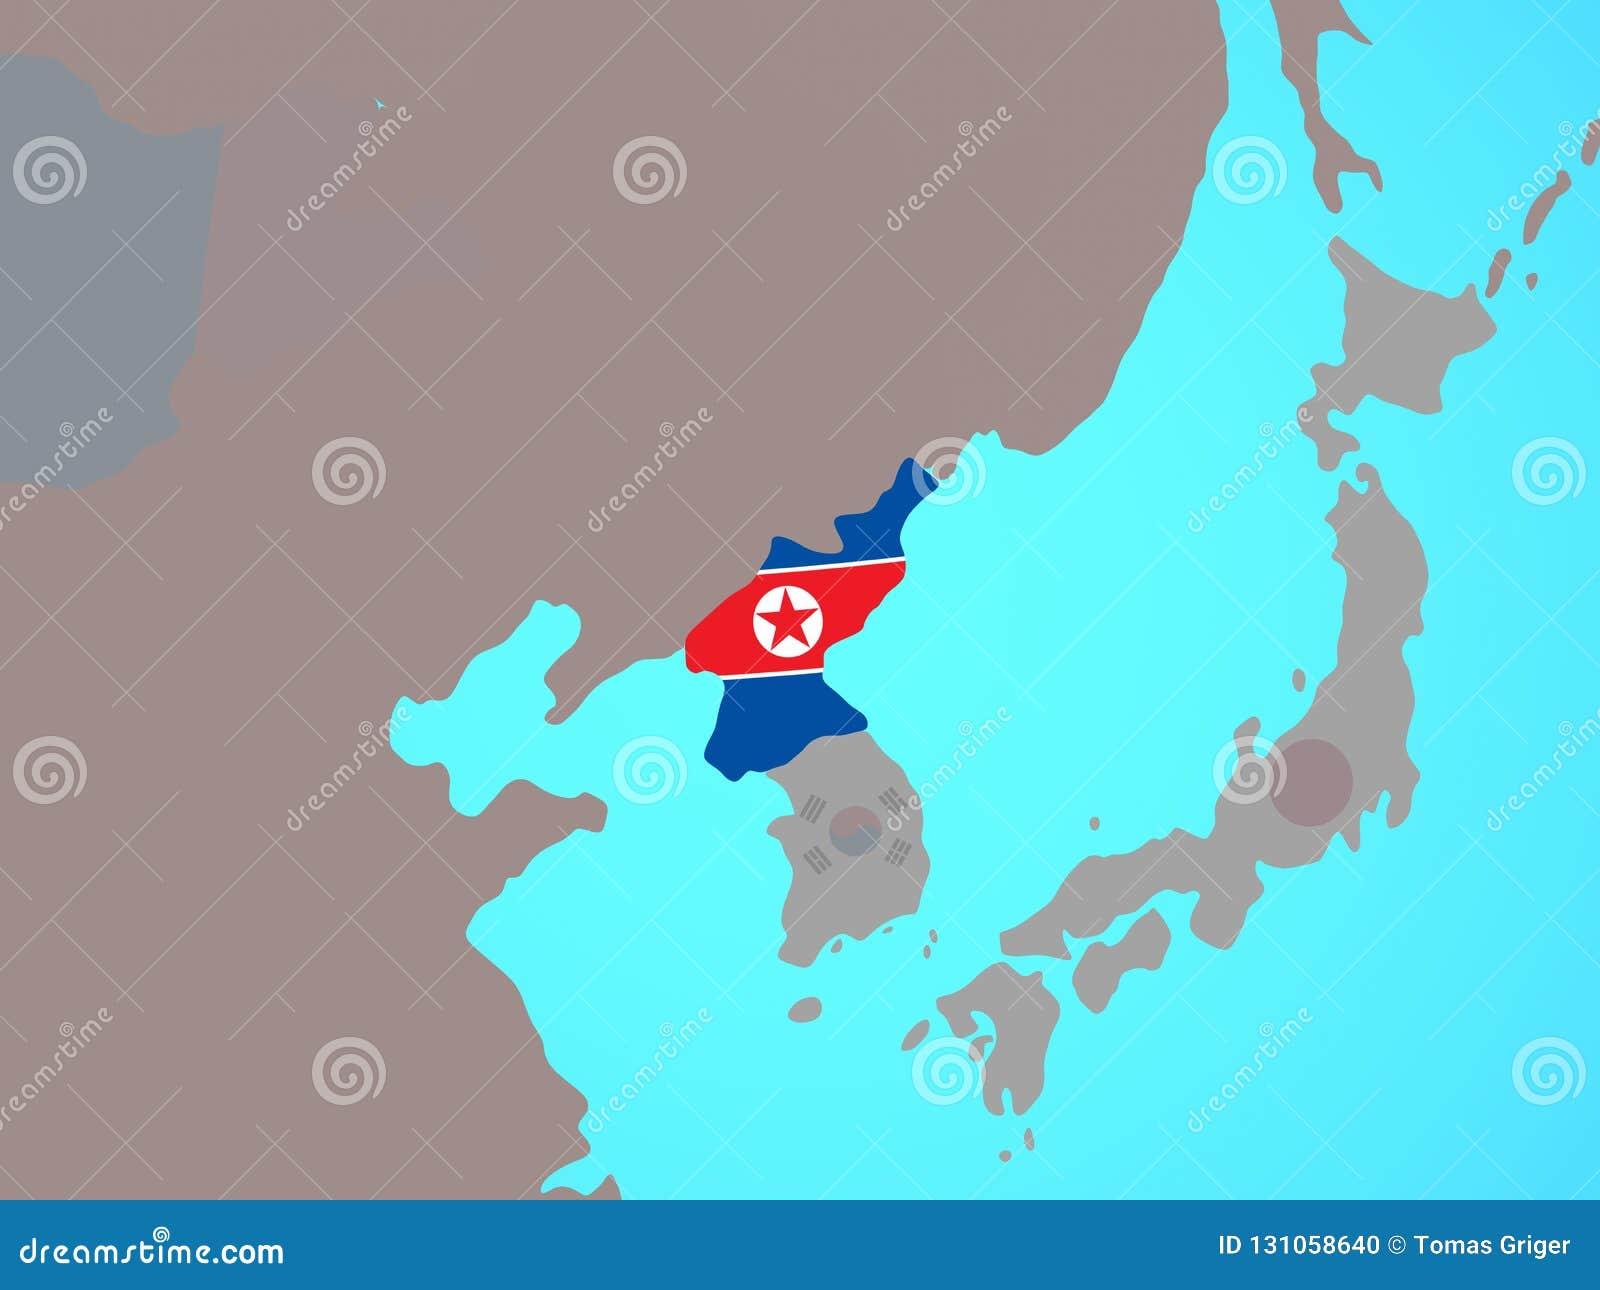 Korea On Map on korean language, south korea, aleutian islands on map, pakistan on map, iraq on map, cuba on map, china on map, nanking on map, india on map, kim jong-il, thailand on map, greece on map, manchuria on map, korean peninsula, north korea, iran on map, formosa on map, germany on map, himalayas on map, philippines map, kim jong-un, kim il-sung, okinawa on map, japan on map, korean war, asia on map, vietnam on map, samoa on map,